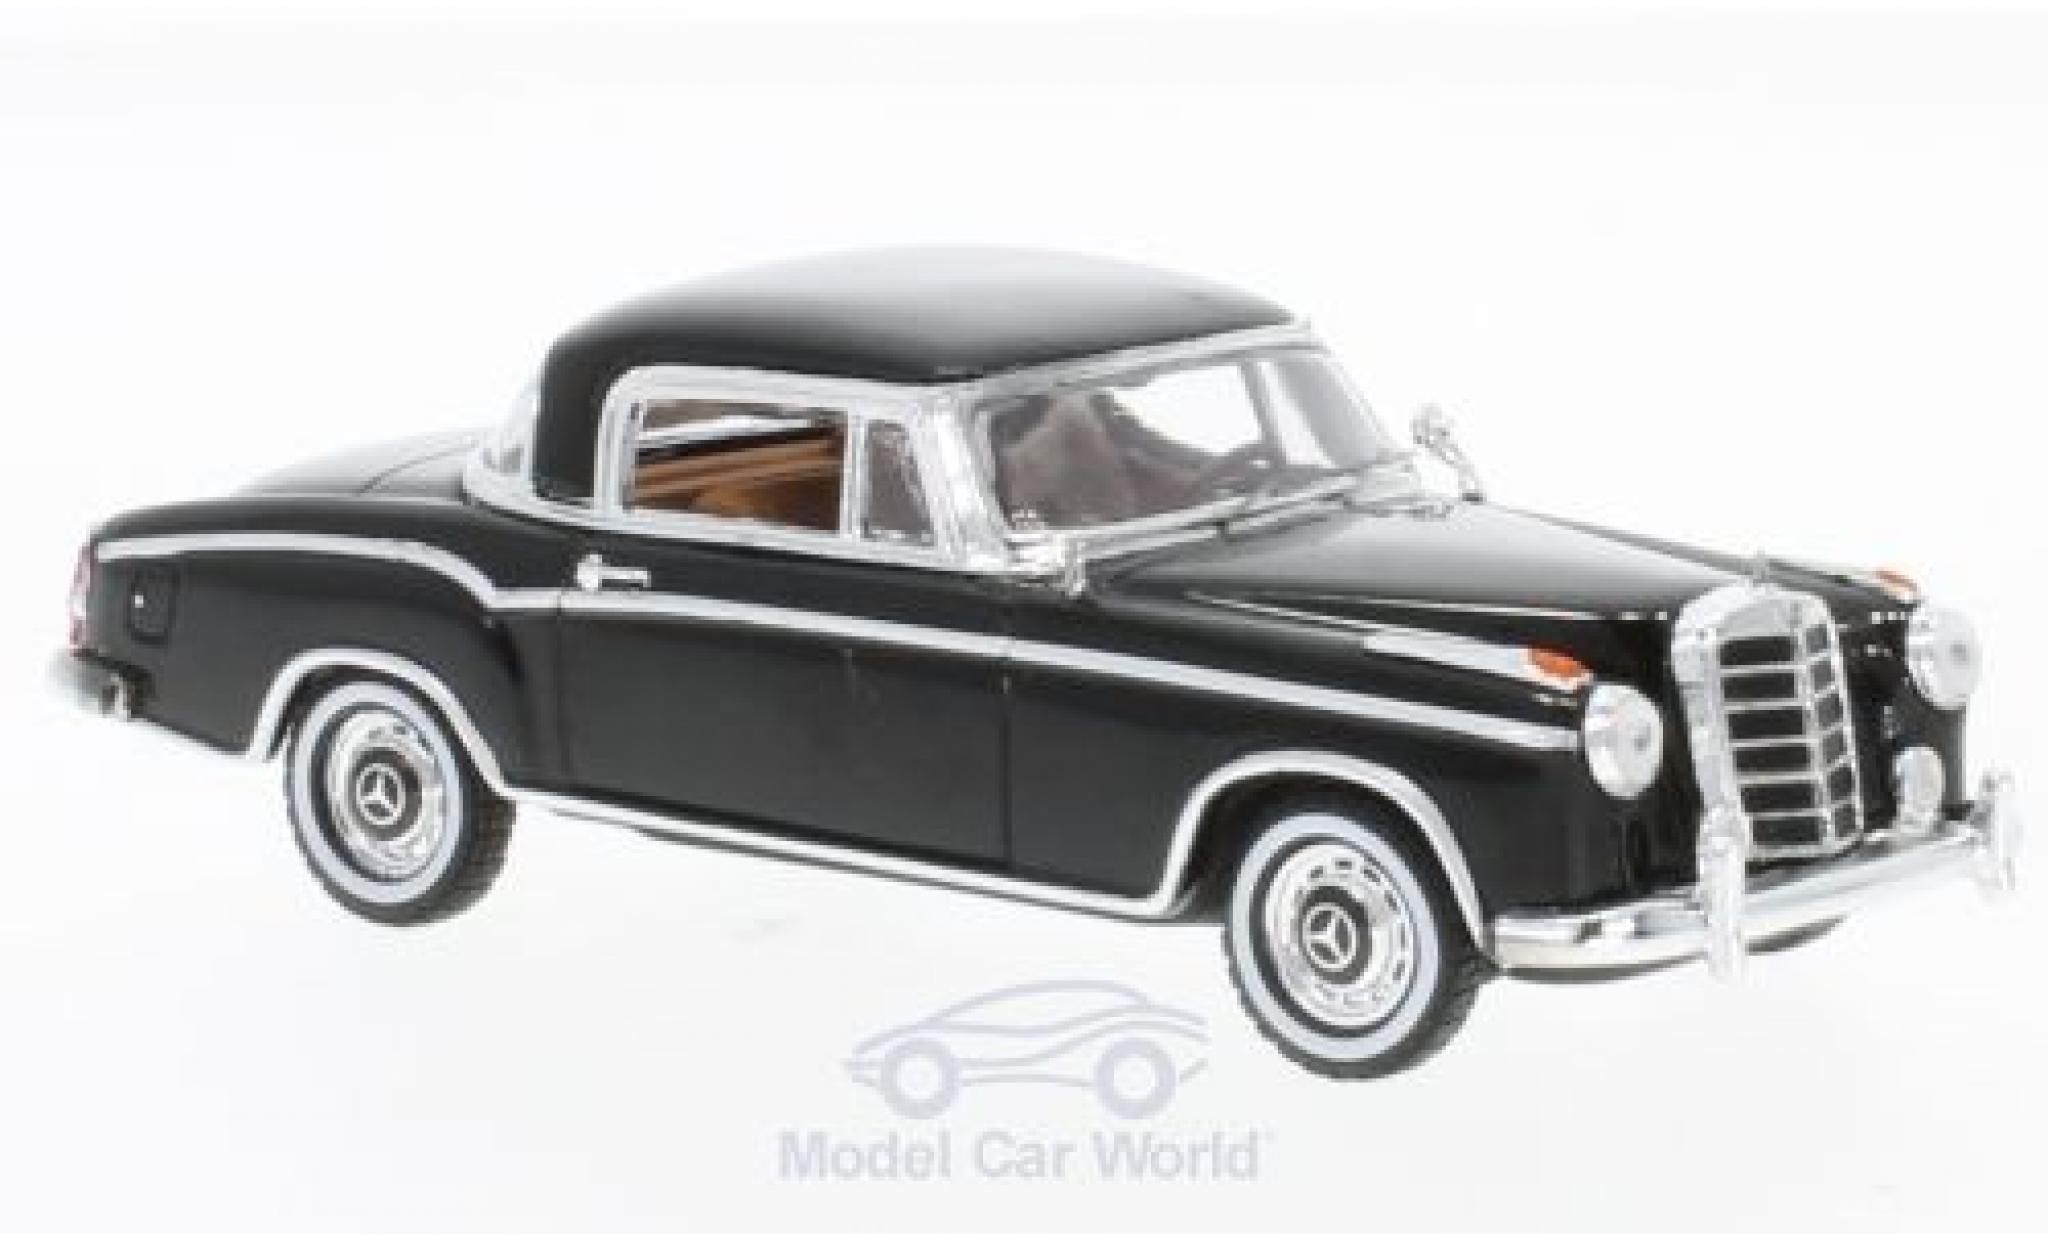 Mercedes 220 SE 1/43 Vitesse Coupe black 1958